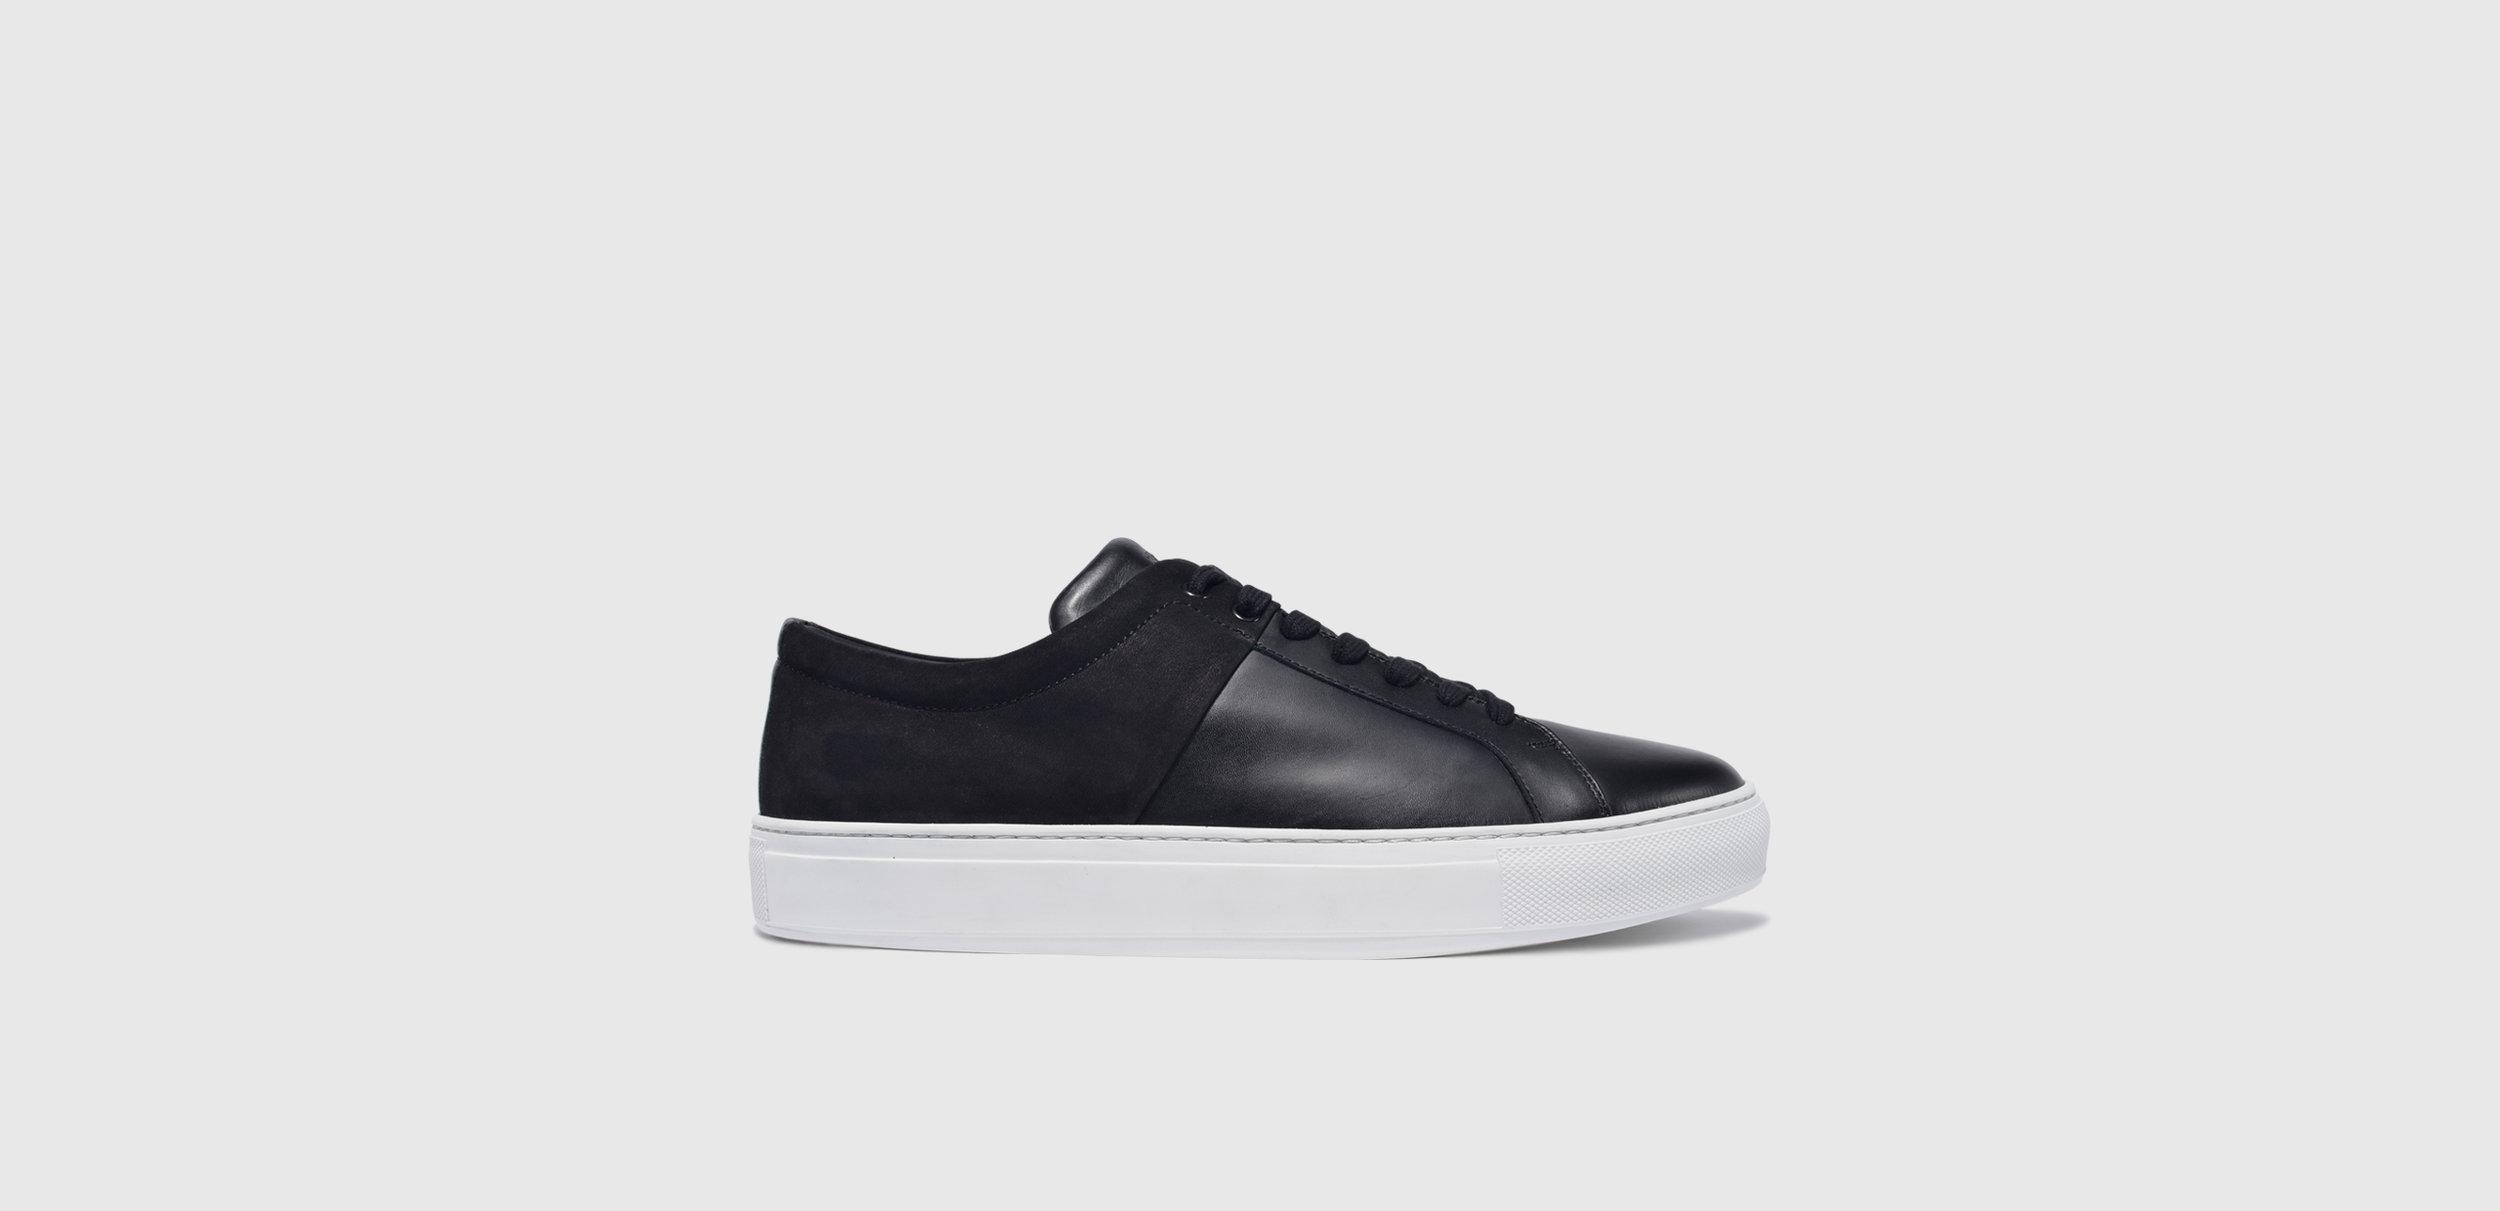 blucher-01-nubuck-leather-black-m-1.jpg